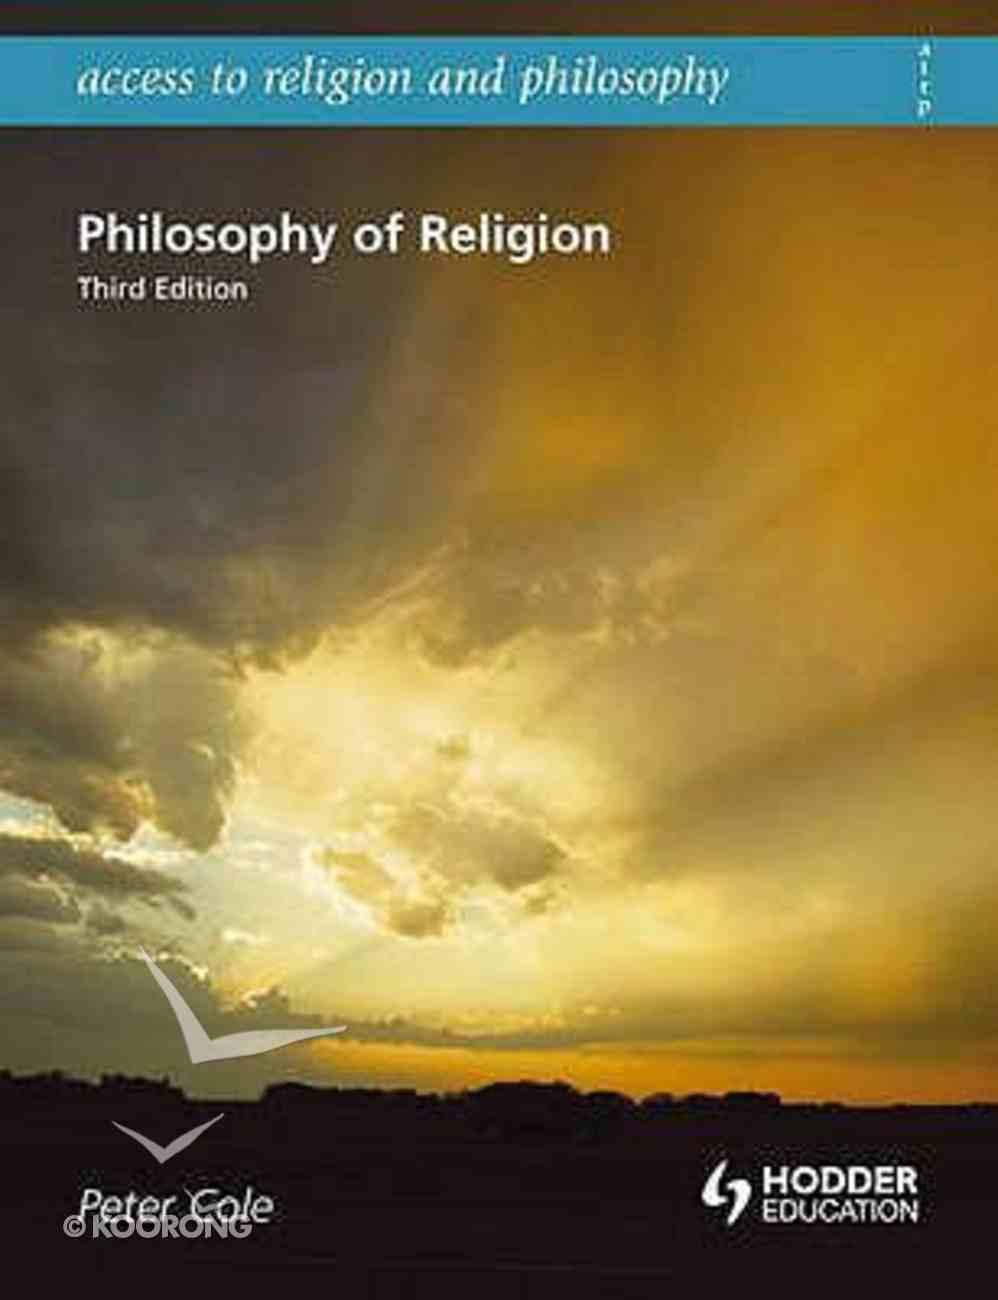 Philosophy of Religion Senior School (Third Edition) Paperback